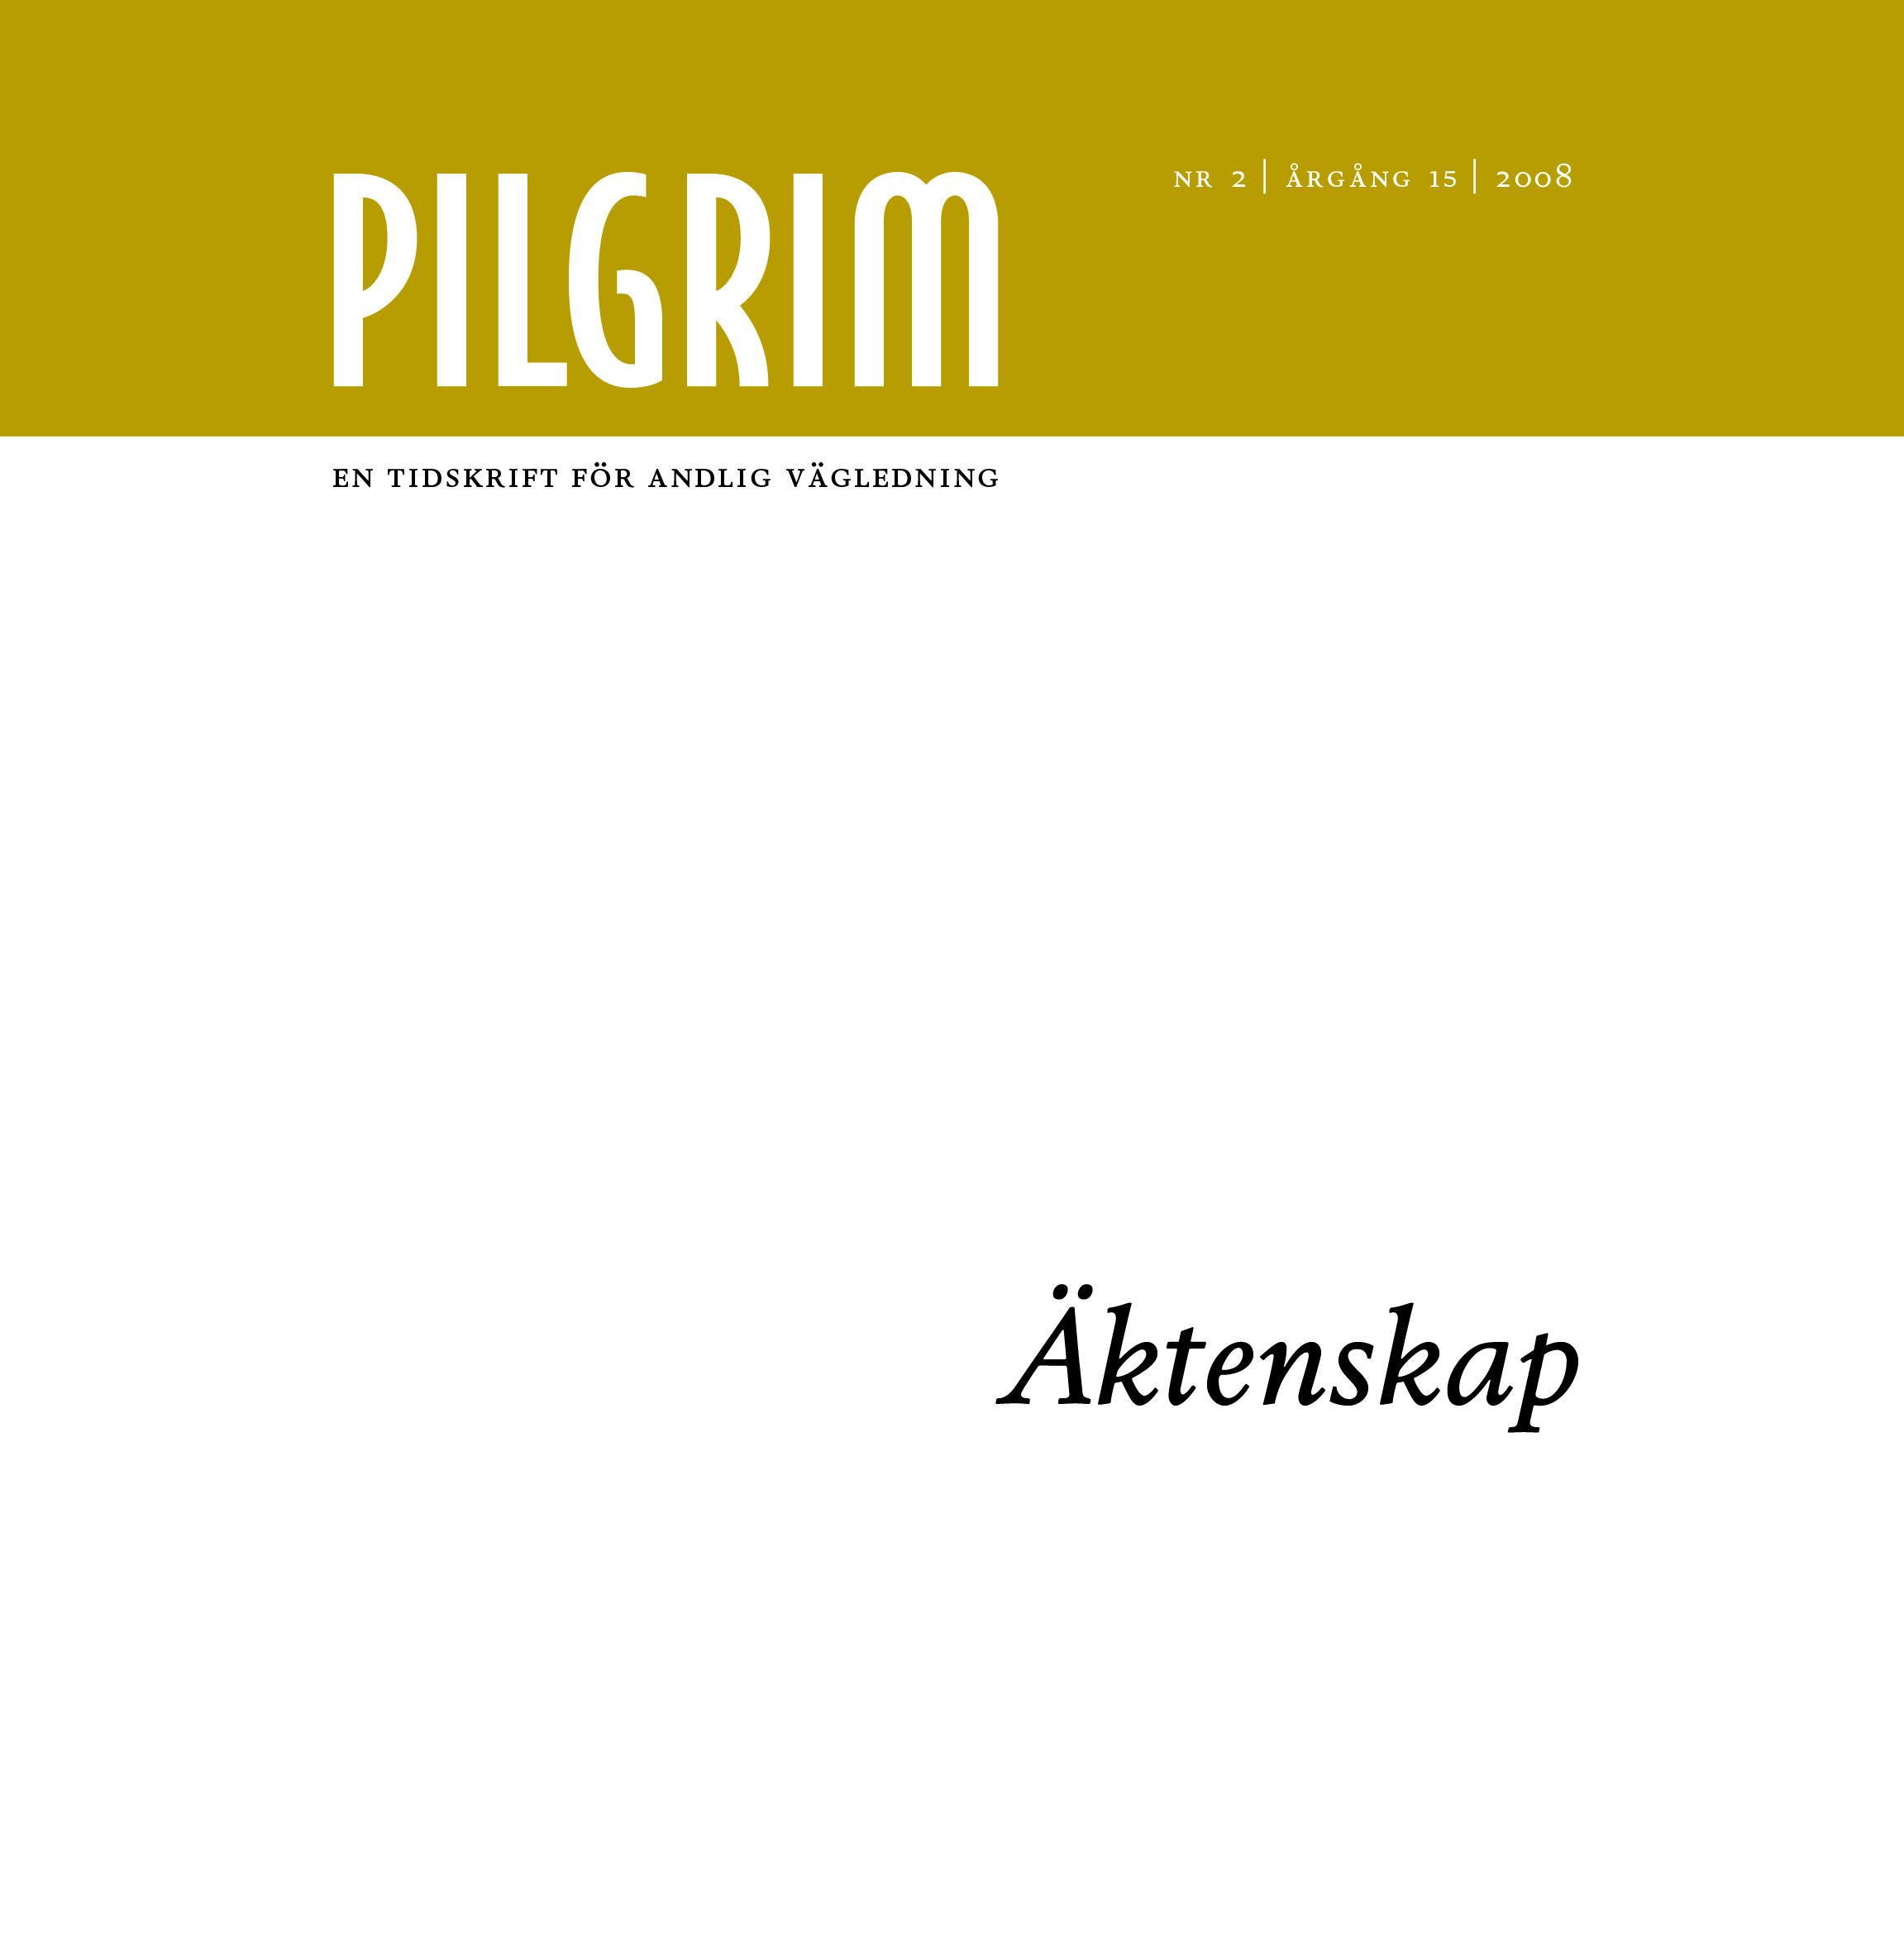 Pilgrim frams 2008-2